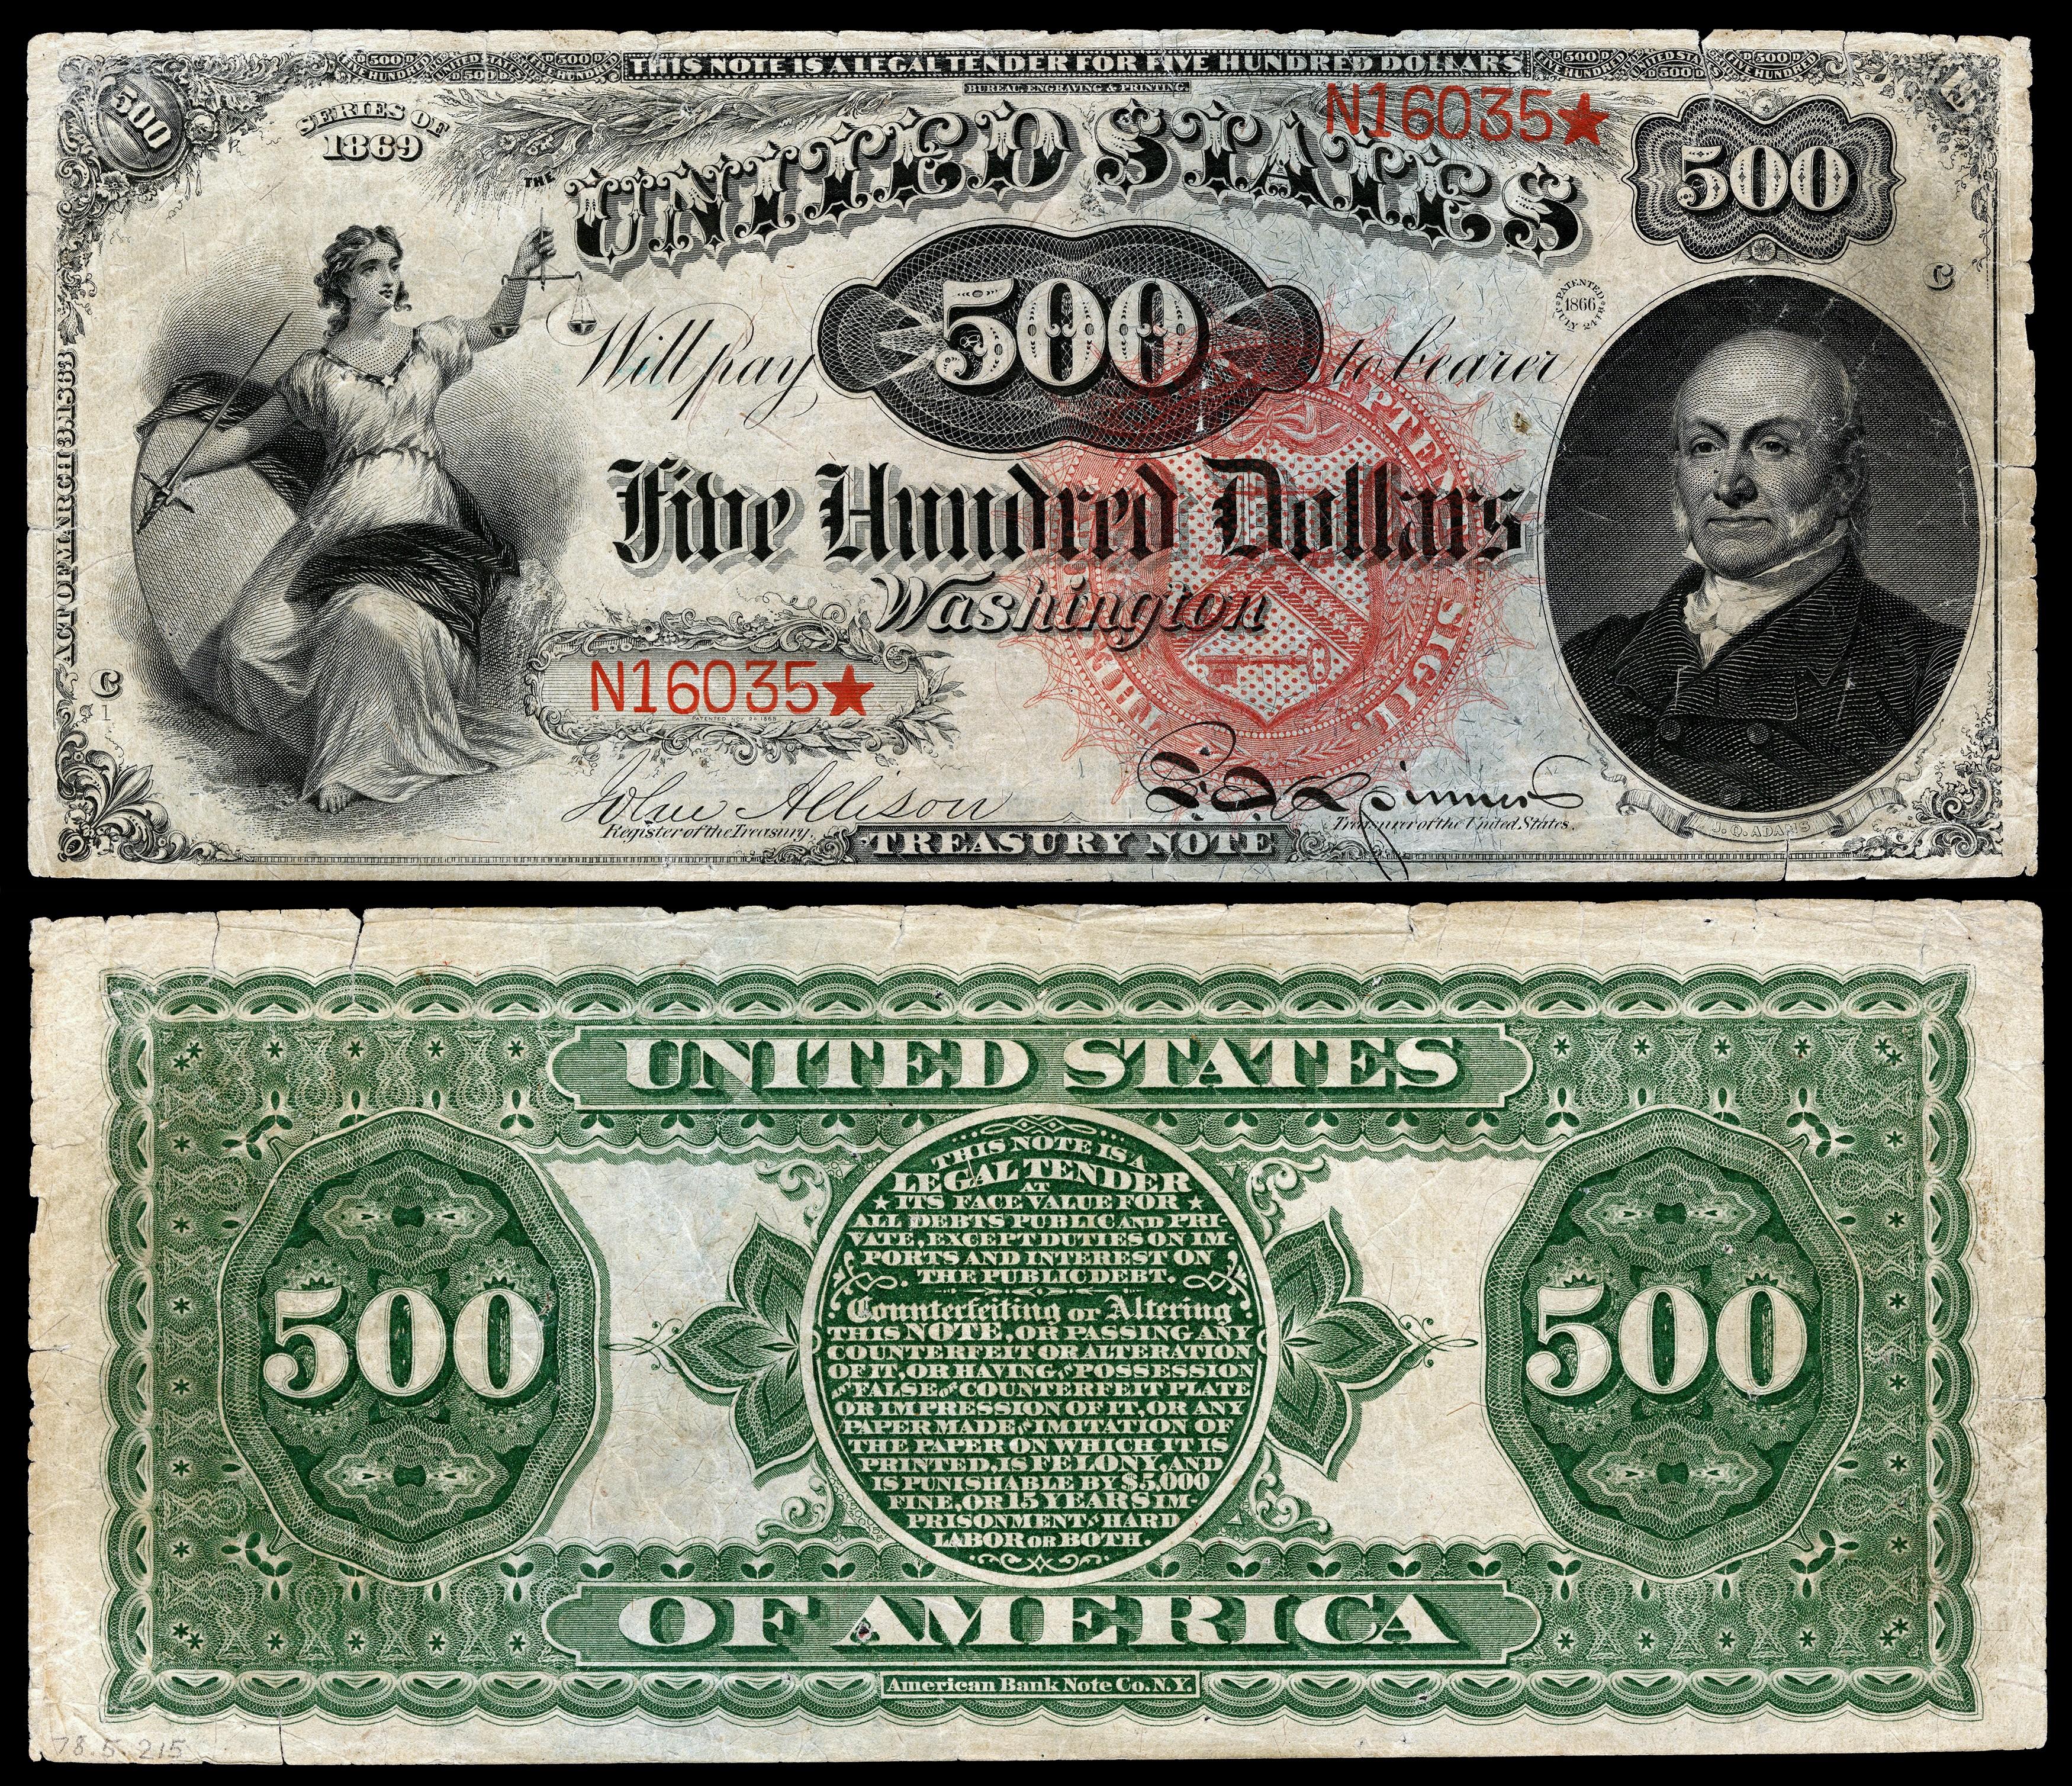 US-$500-LT-1869-Fr-184.jpg